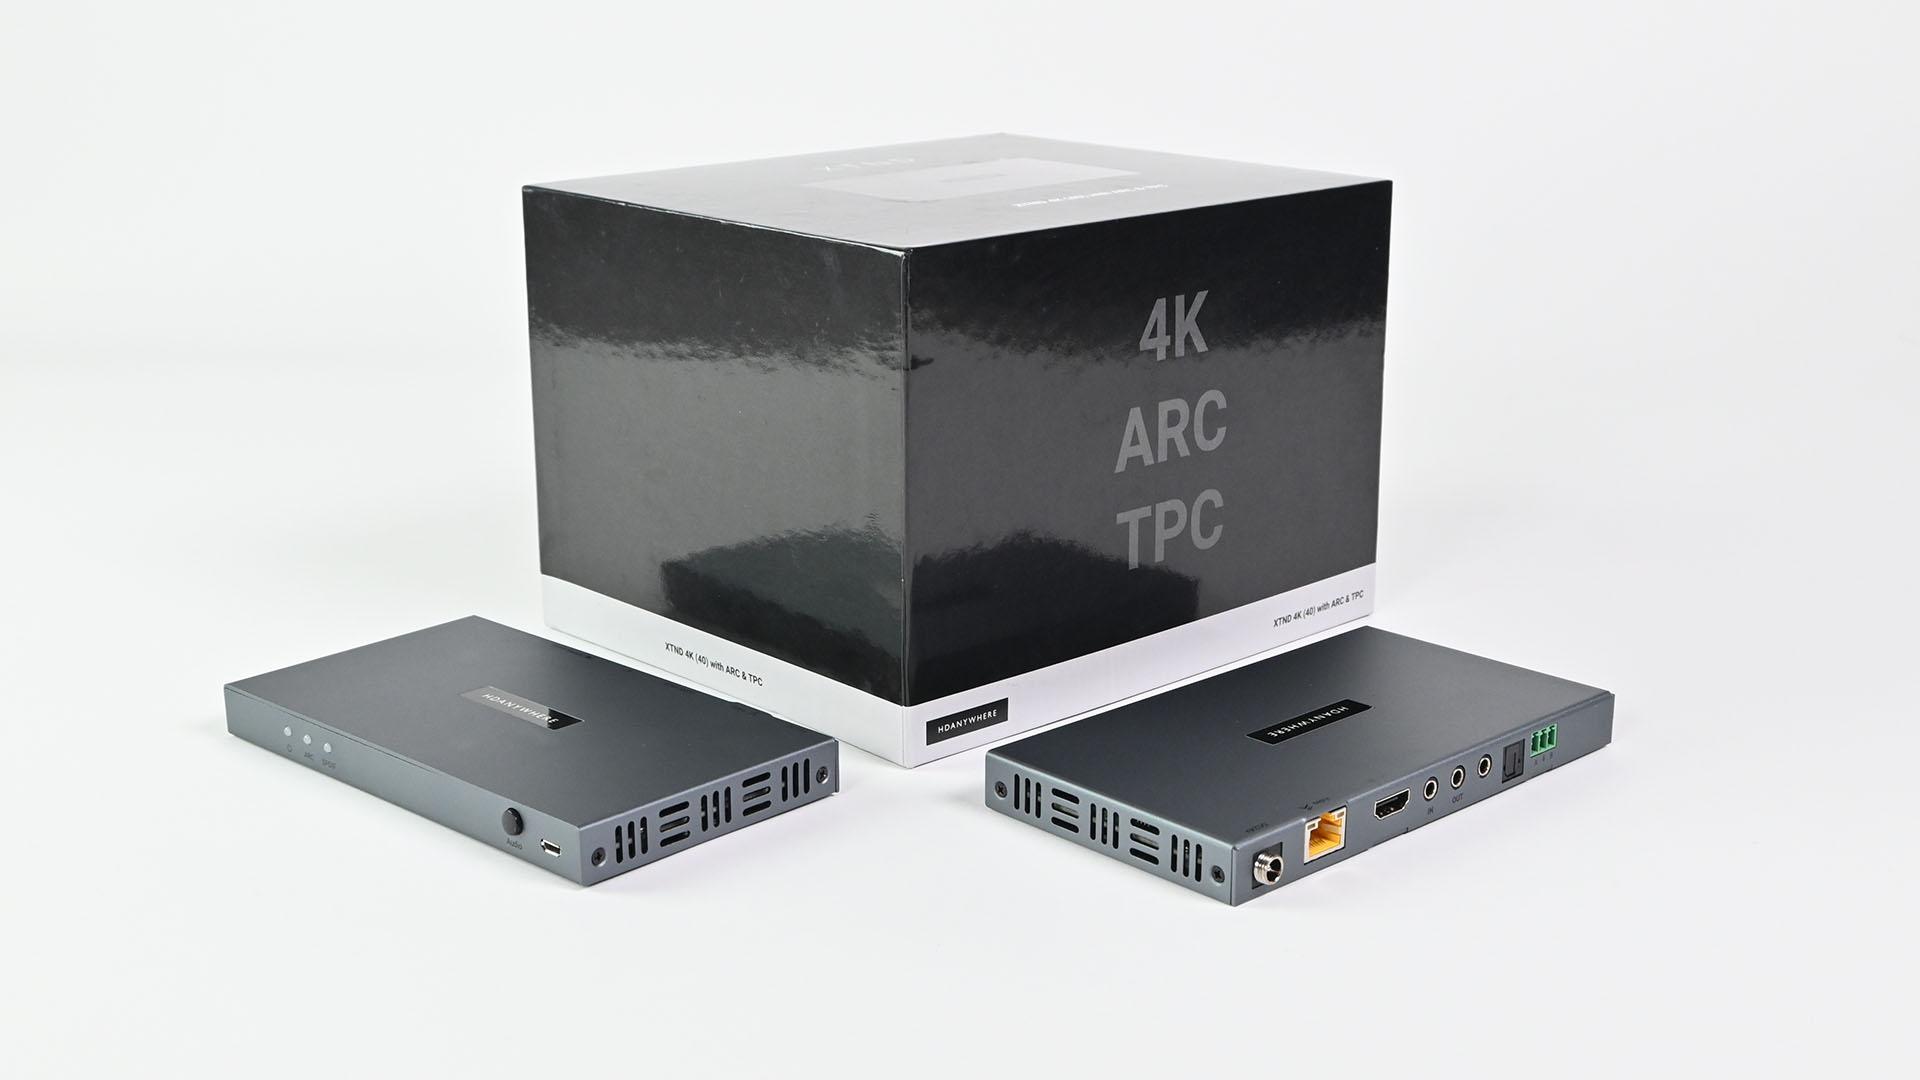 XTND 4K (40) ARC + TPC